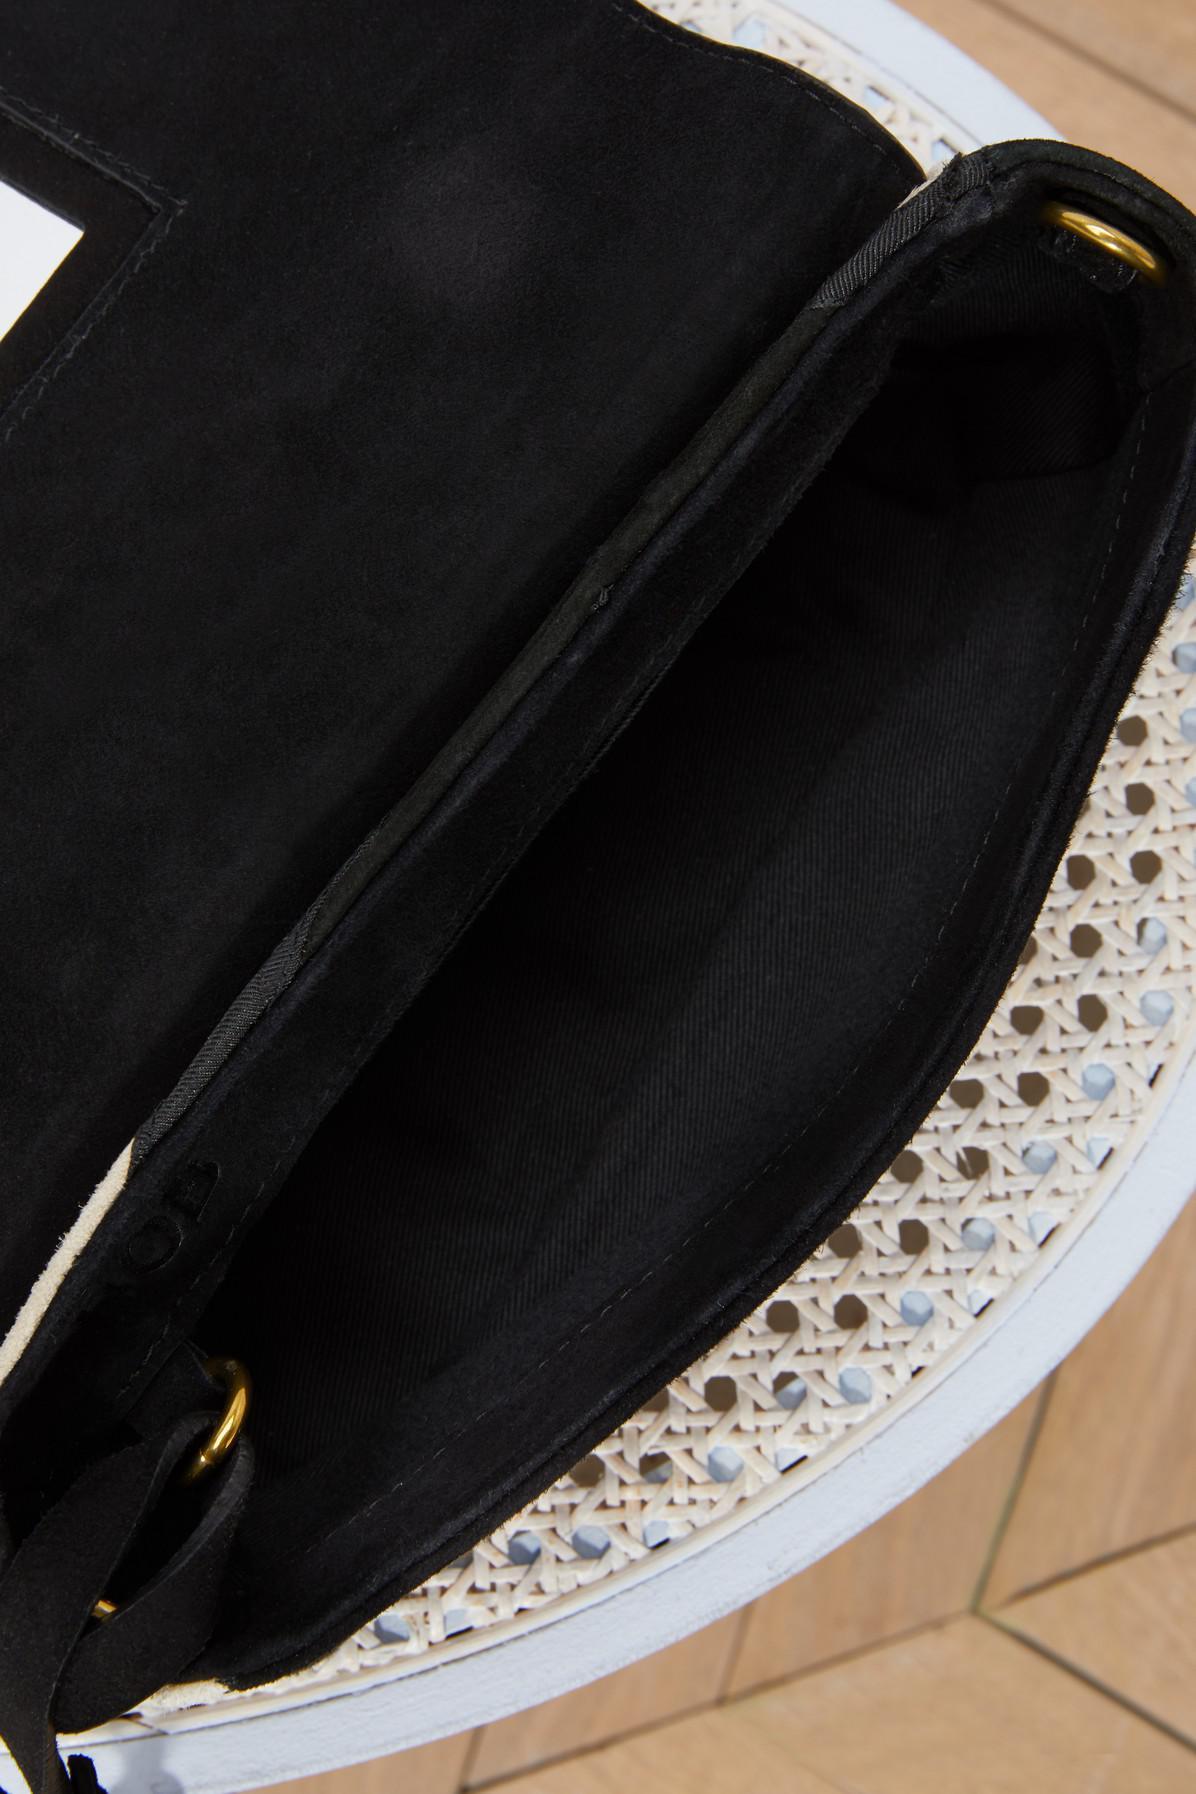 Jérôme Dreyfuss Leather Bob Patchwork Zigzag Crossbody in Black